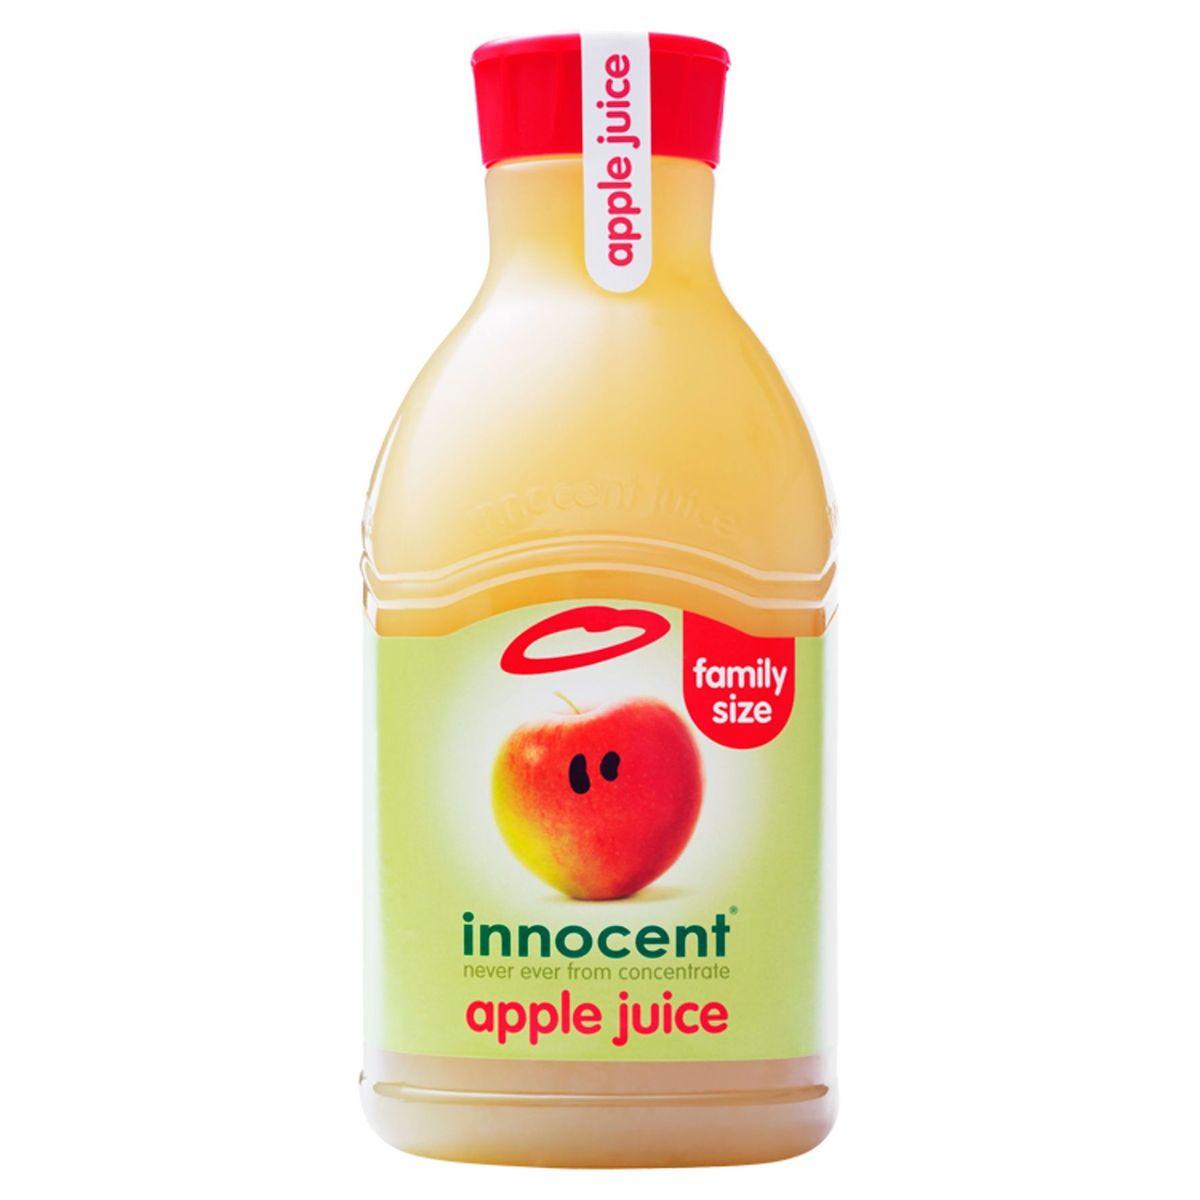 Innocent Apple Juice Family Size 1.5 L